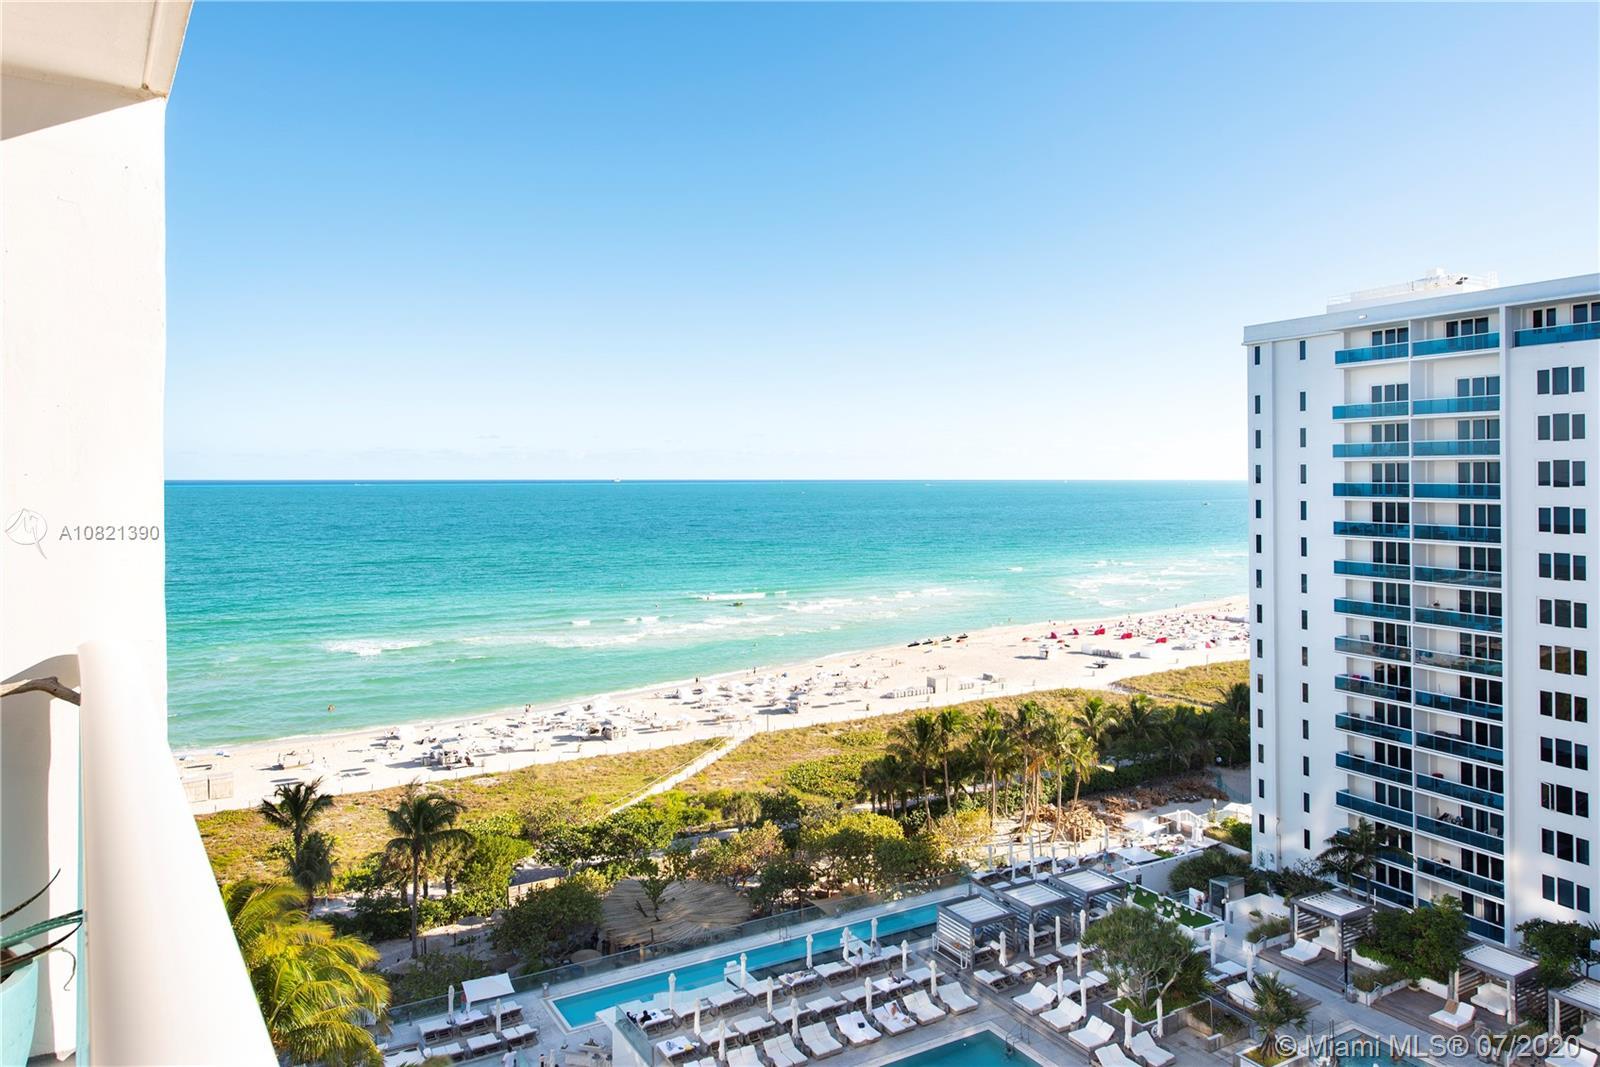 102 24th St Unit 1410, Miami Beach FL 33139